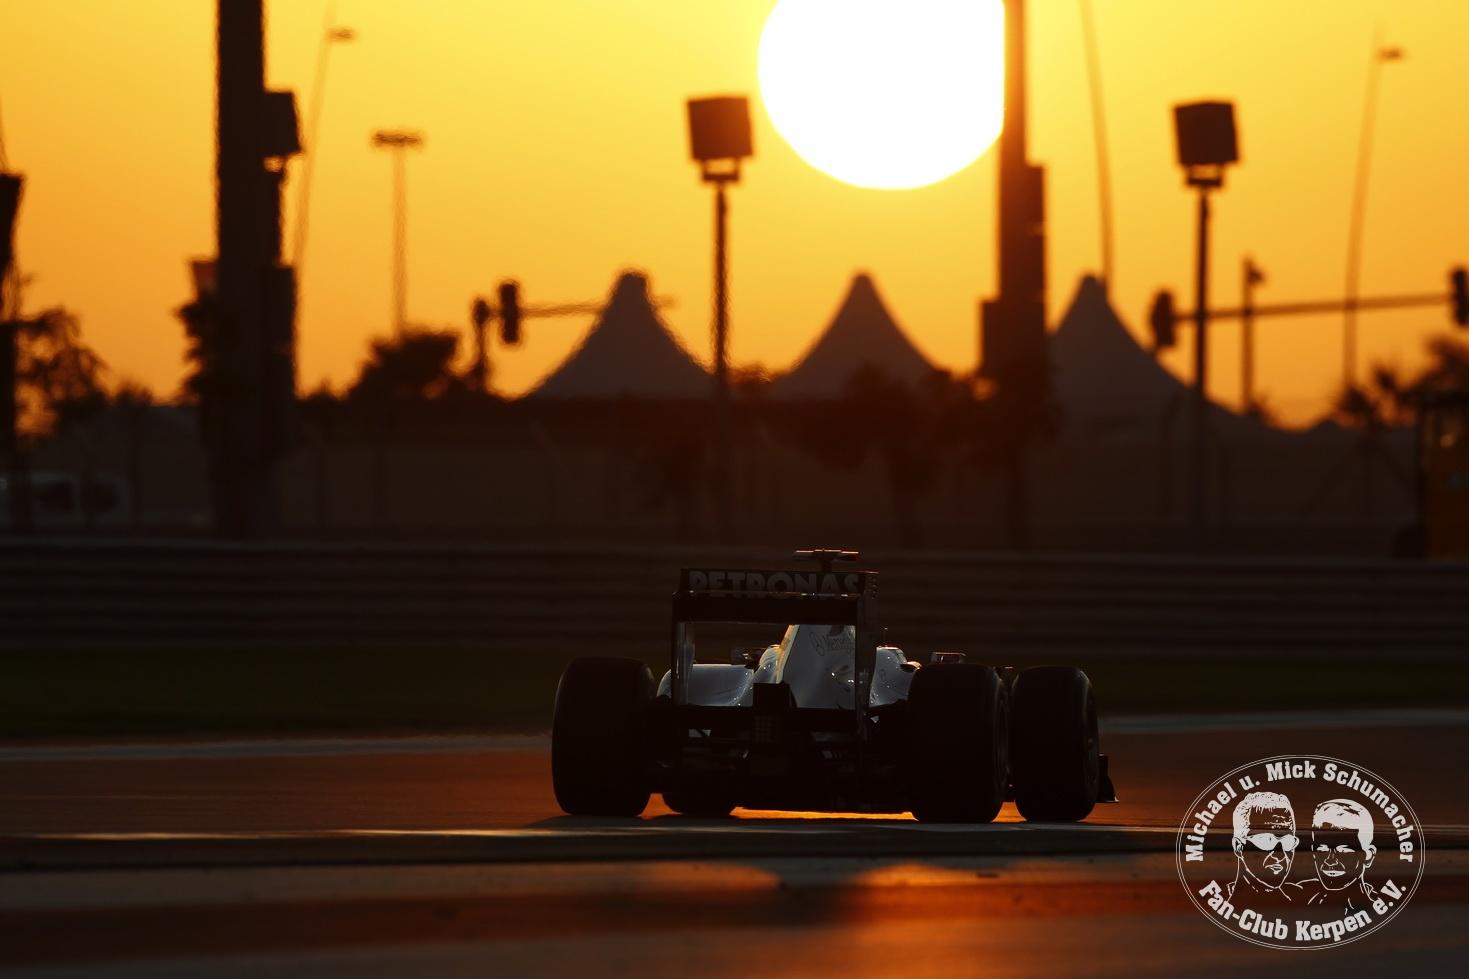 Formel 1, Grand Prix Abu Dhabi 2011, Yas Marina Circuit, 13.11.2011